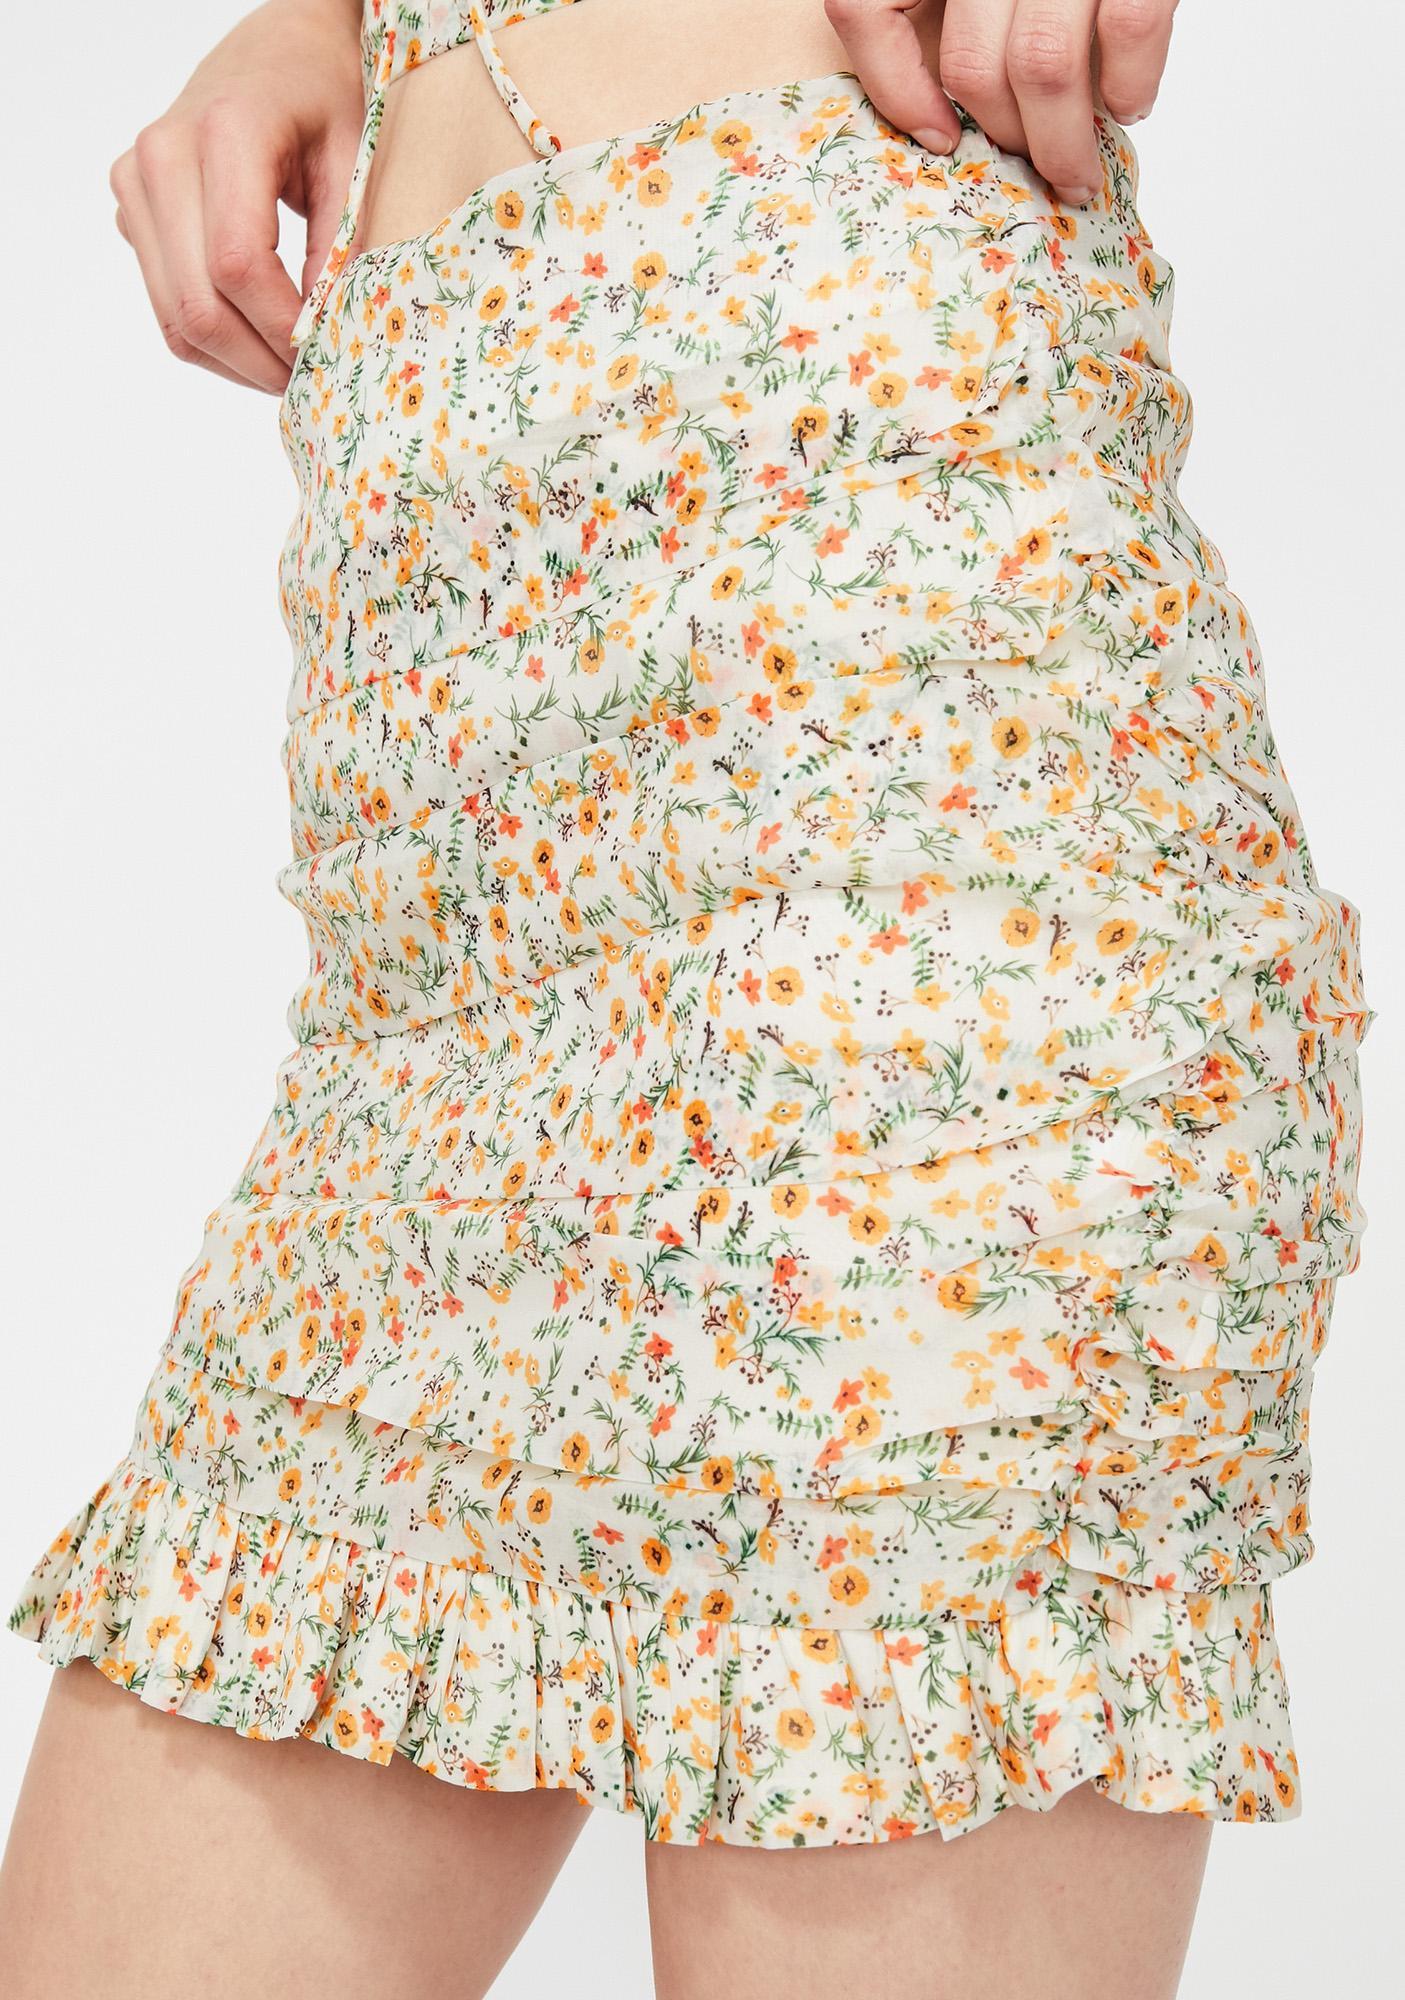 Prairie Princess Mini Skirt